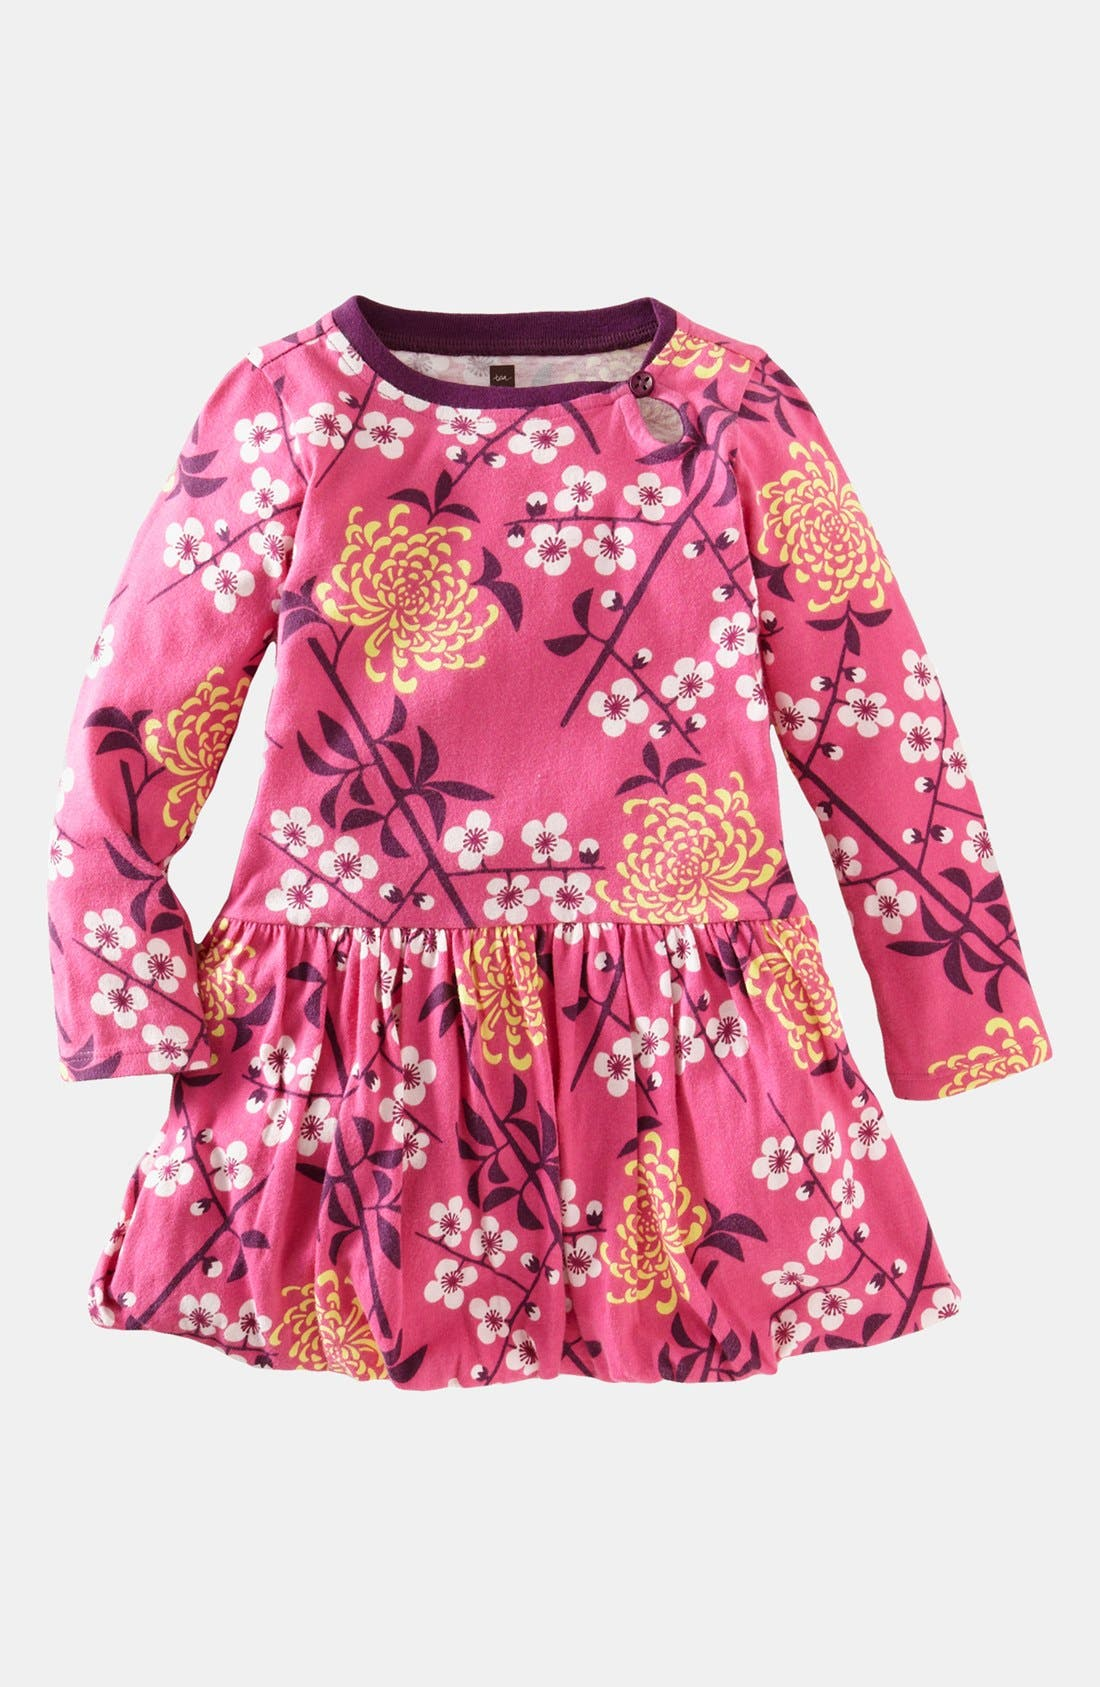 Main Image - Tea Collection 'Branch Blossom' Bubble Dress (Big Girls)